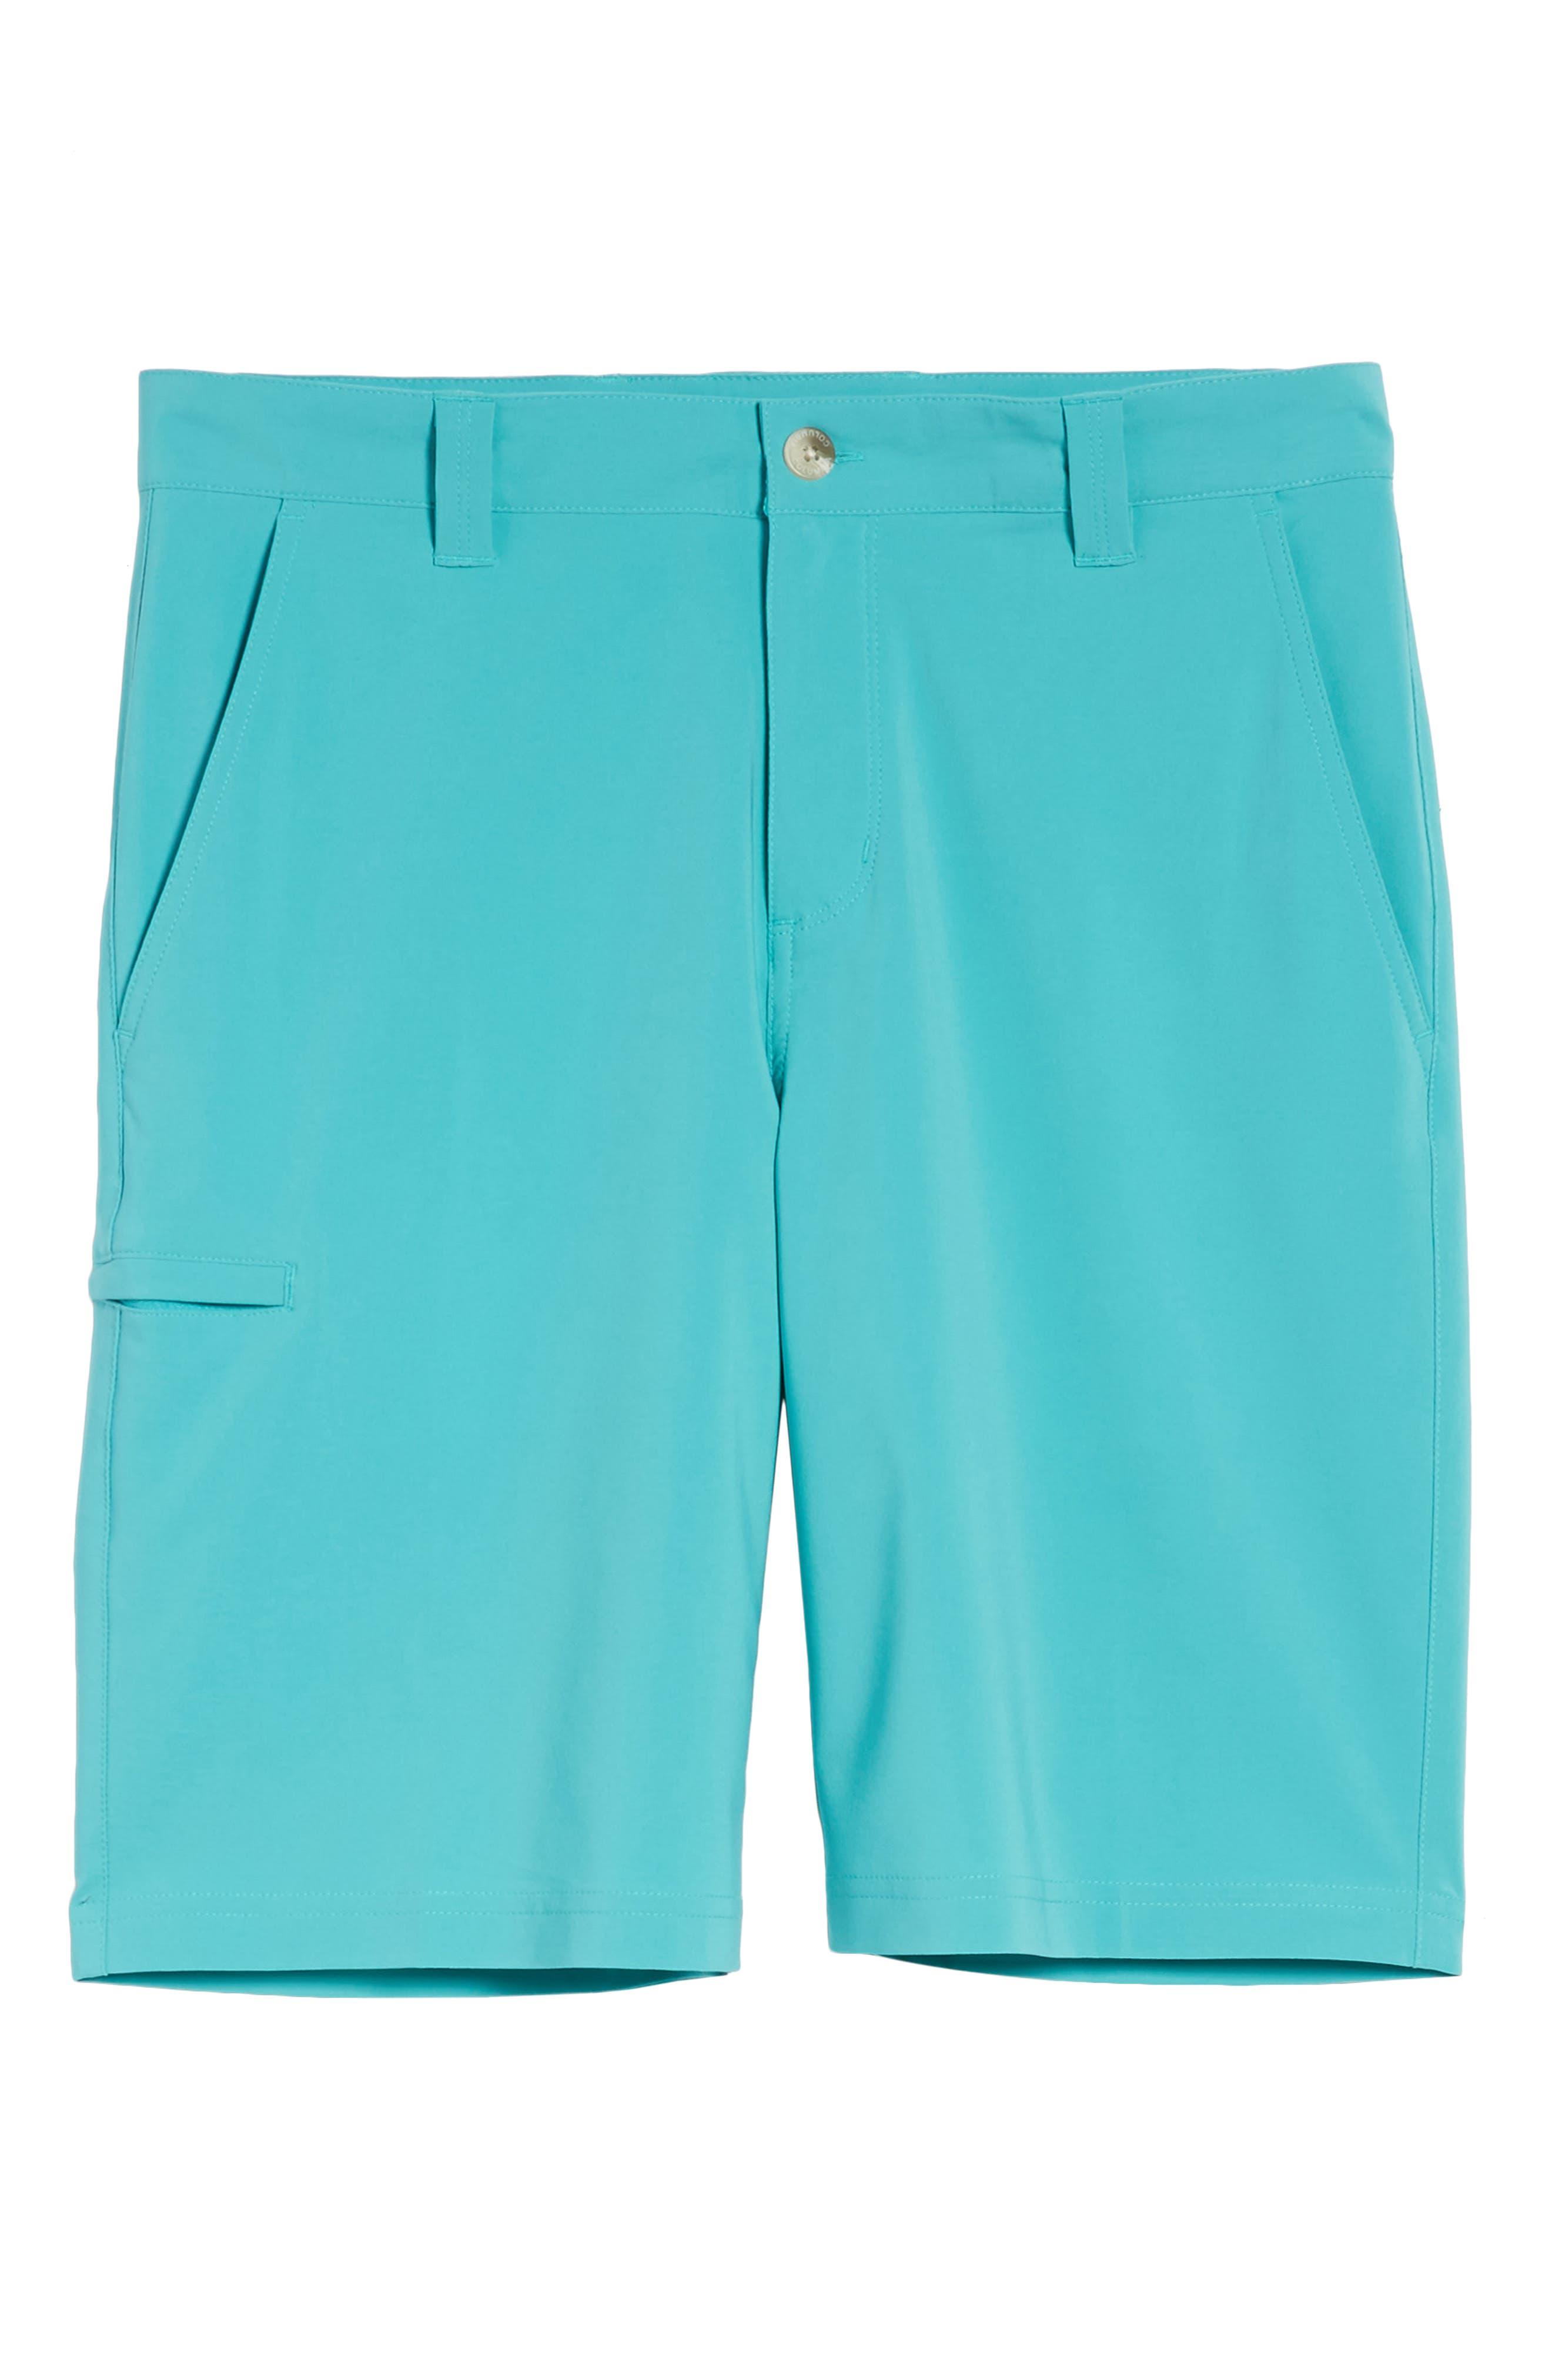 PFG Grander Marlin II Shorts,                             Alternate thumbnail 6, color,                             440